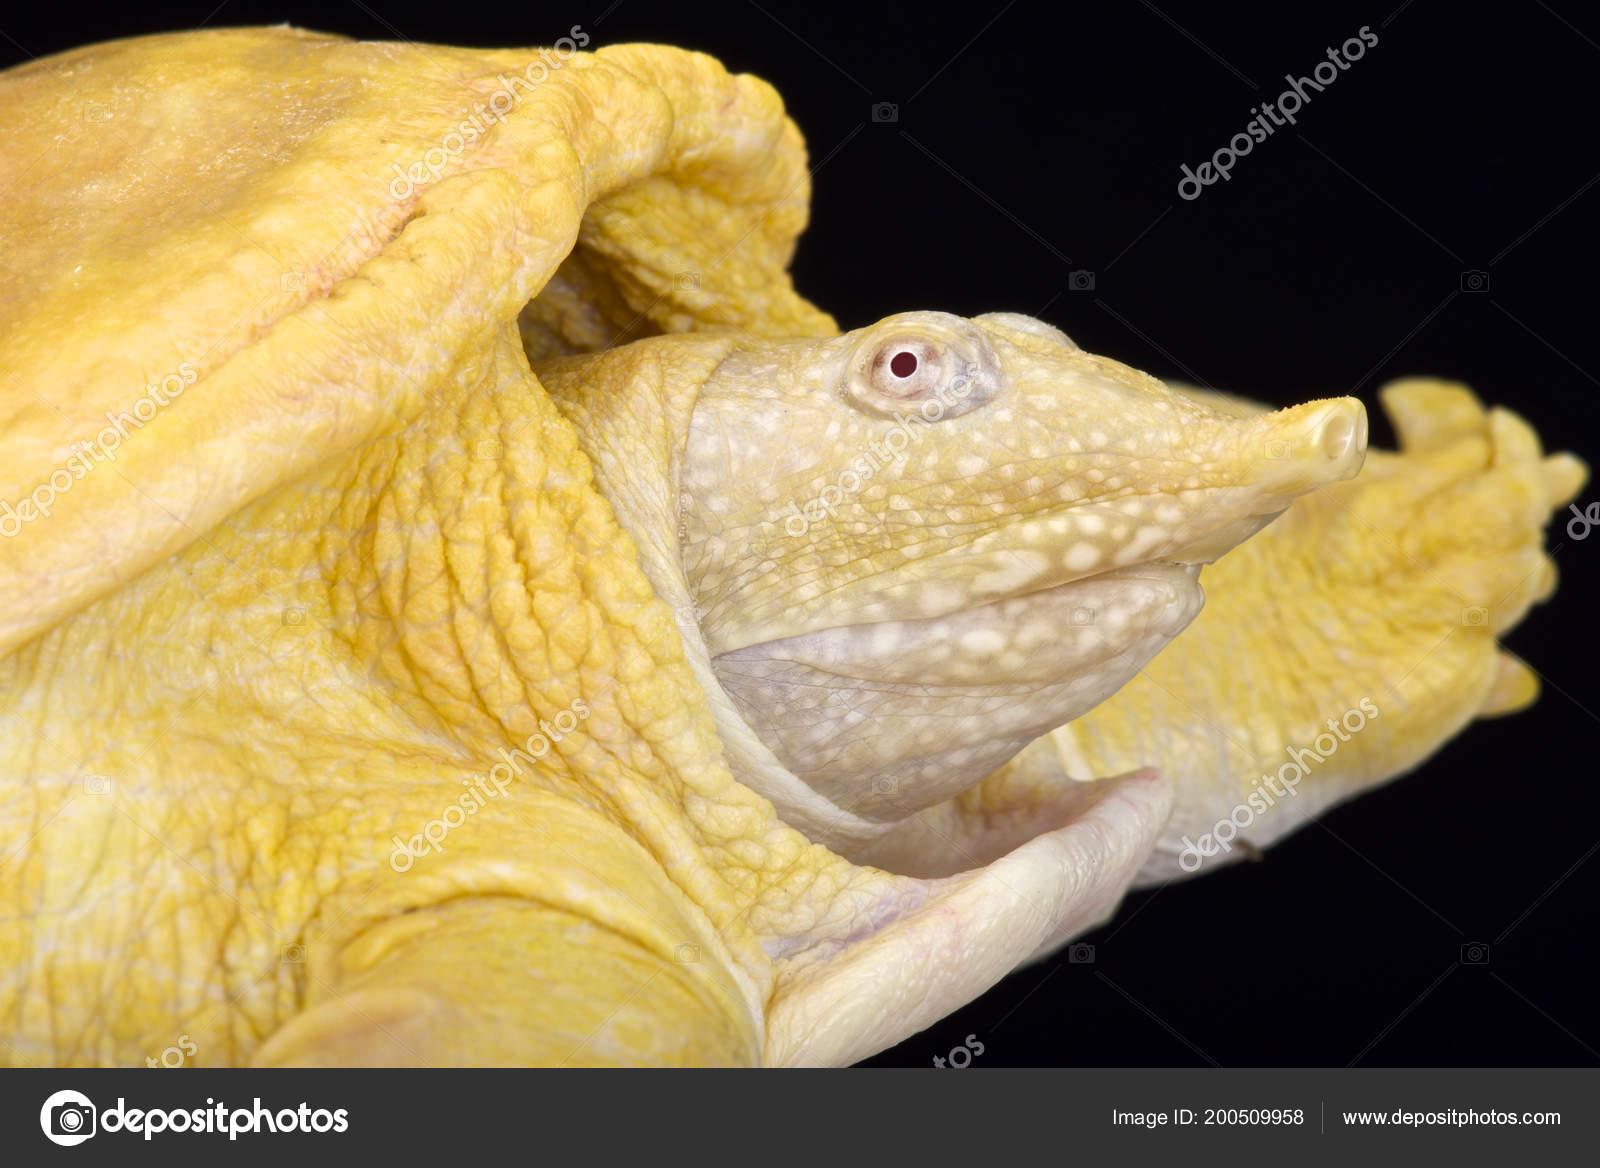 Tartaruga Dal Guscio Molle.Tartaruga Dal Guscio Molle Asiatica Amyda Cartilaginea Albino Foto